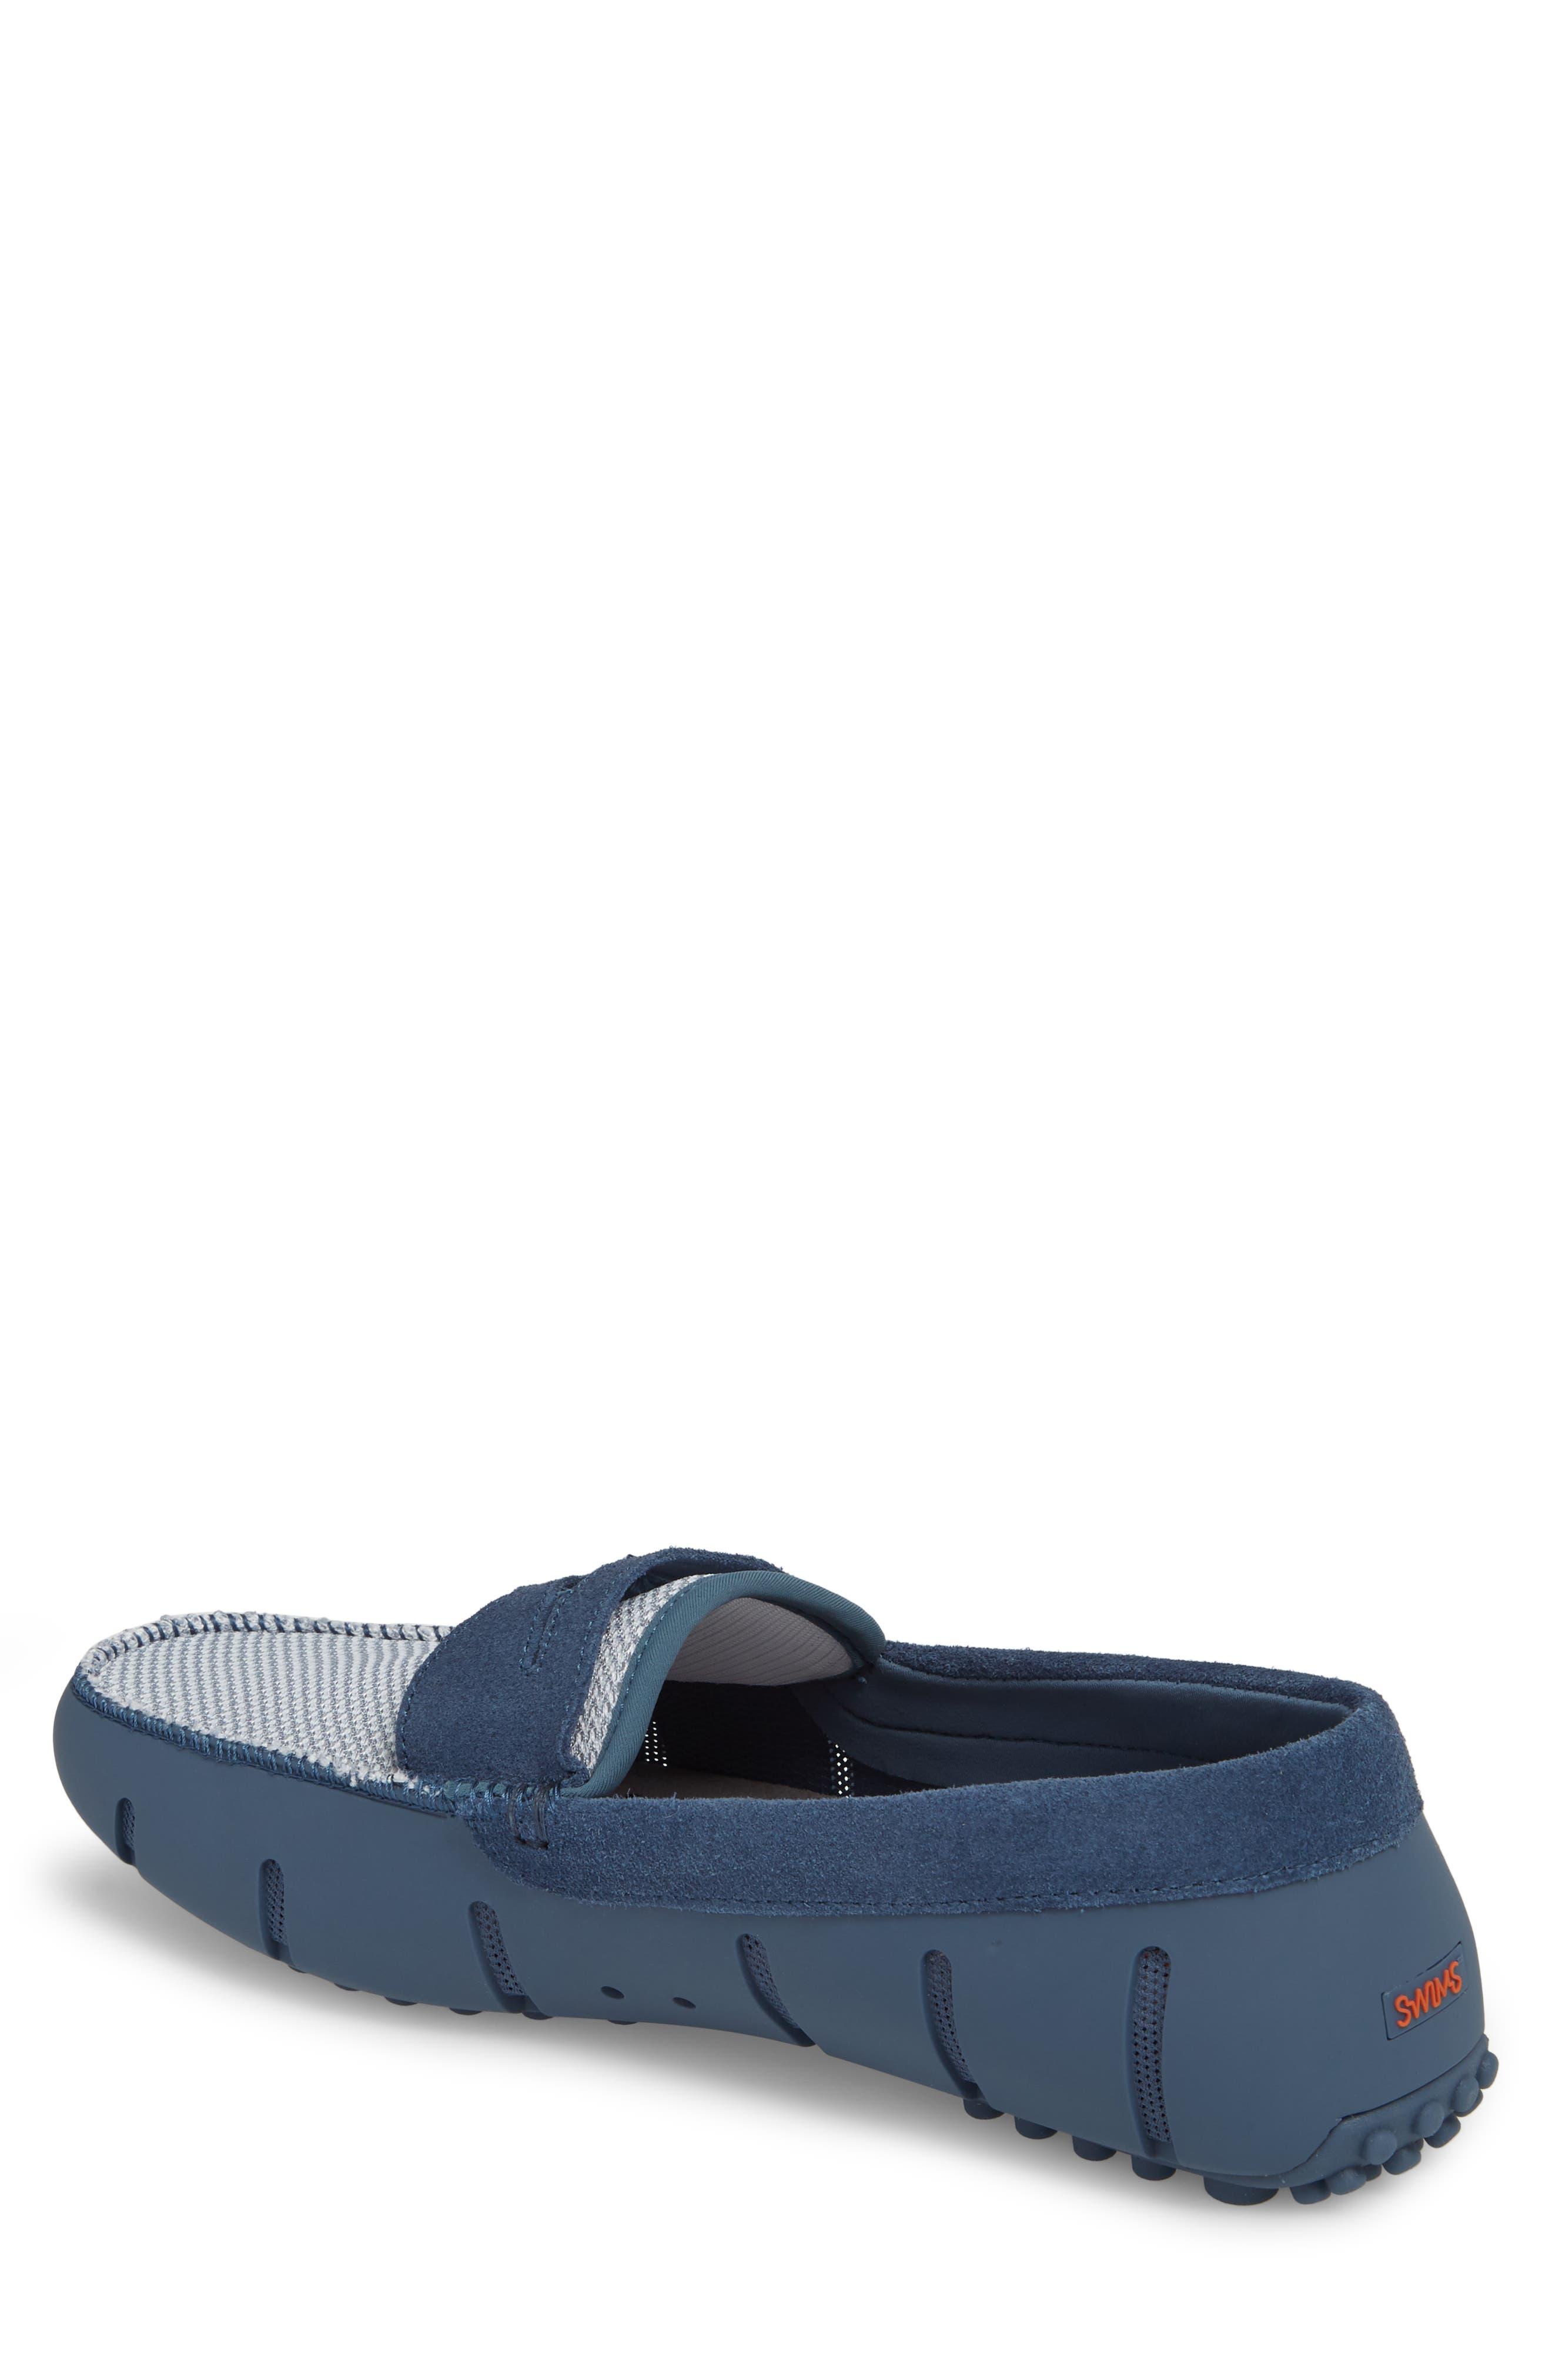 Driving Shoe,                             Alternate thumbnail 2, color,                             SLATE/ WHITE FABRIC